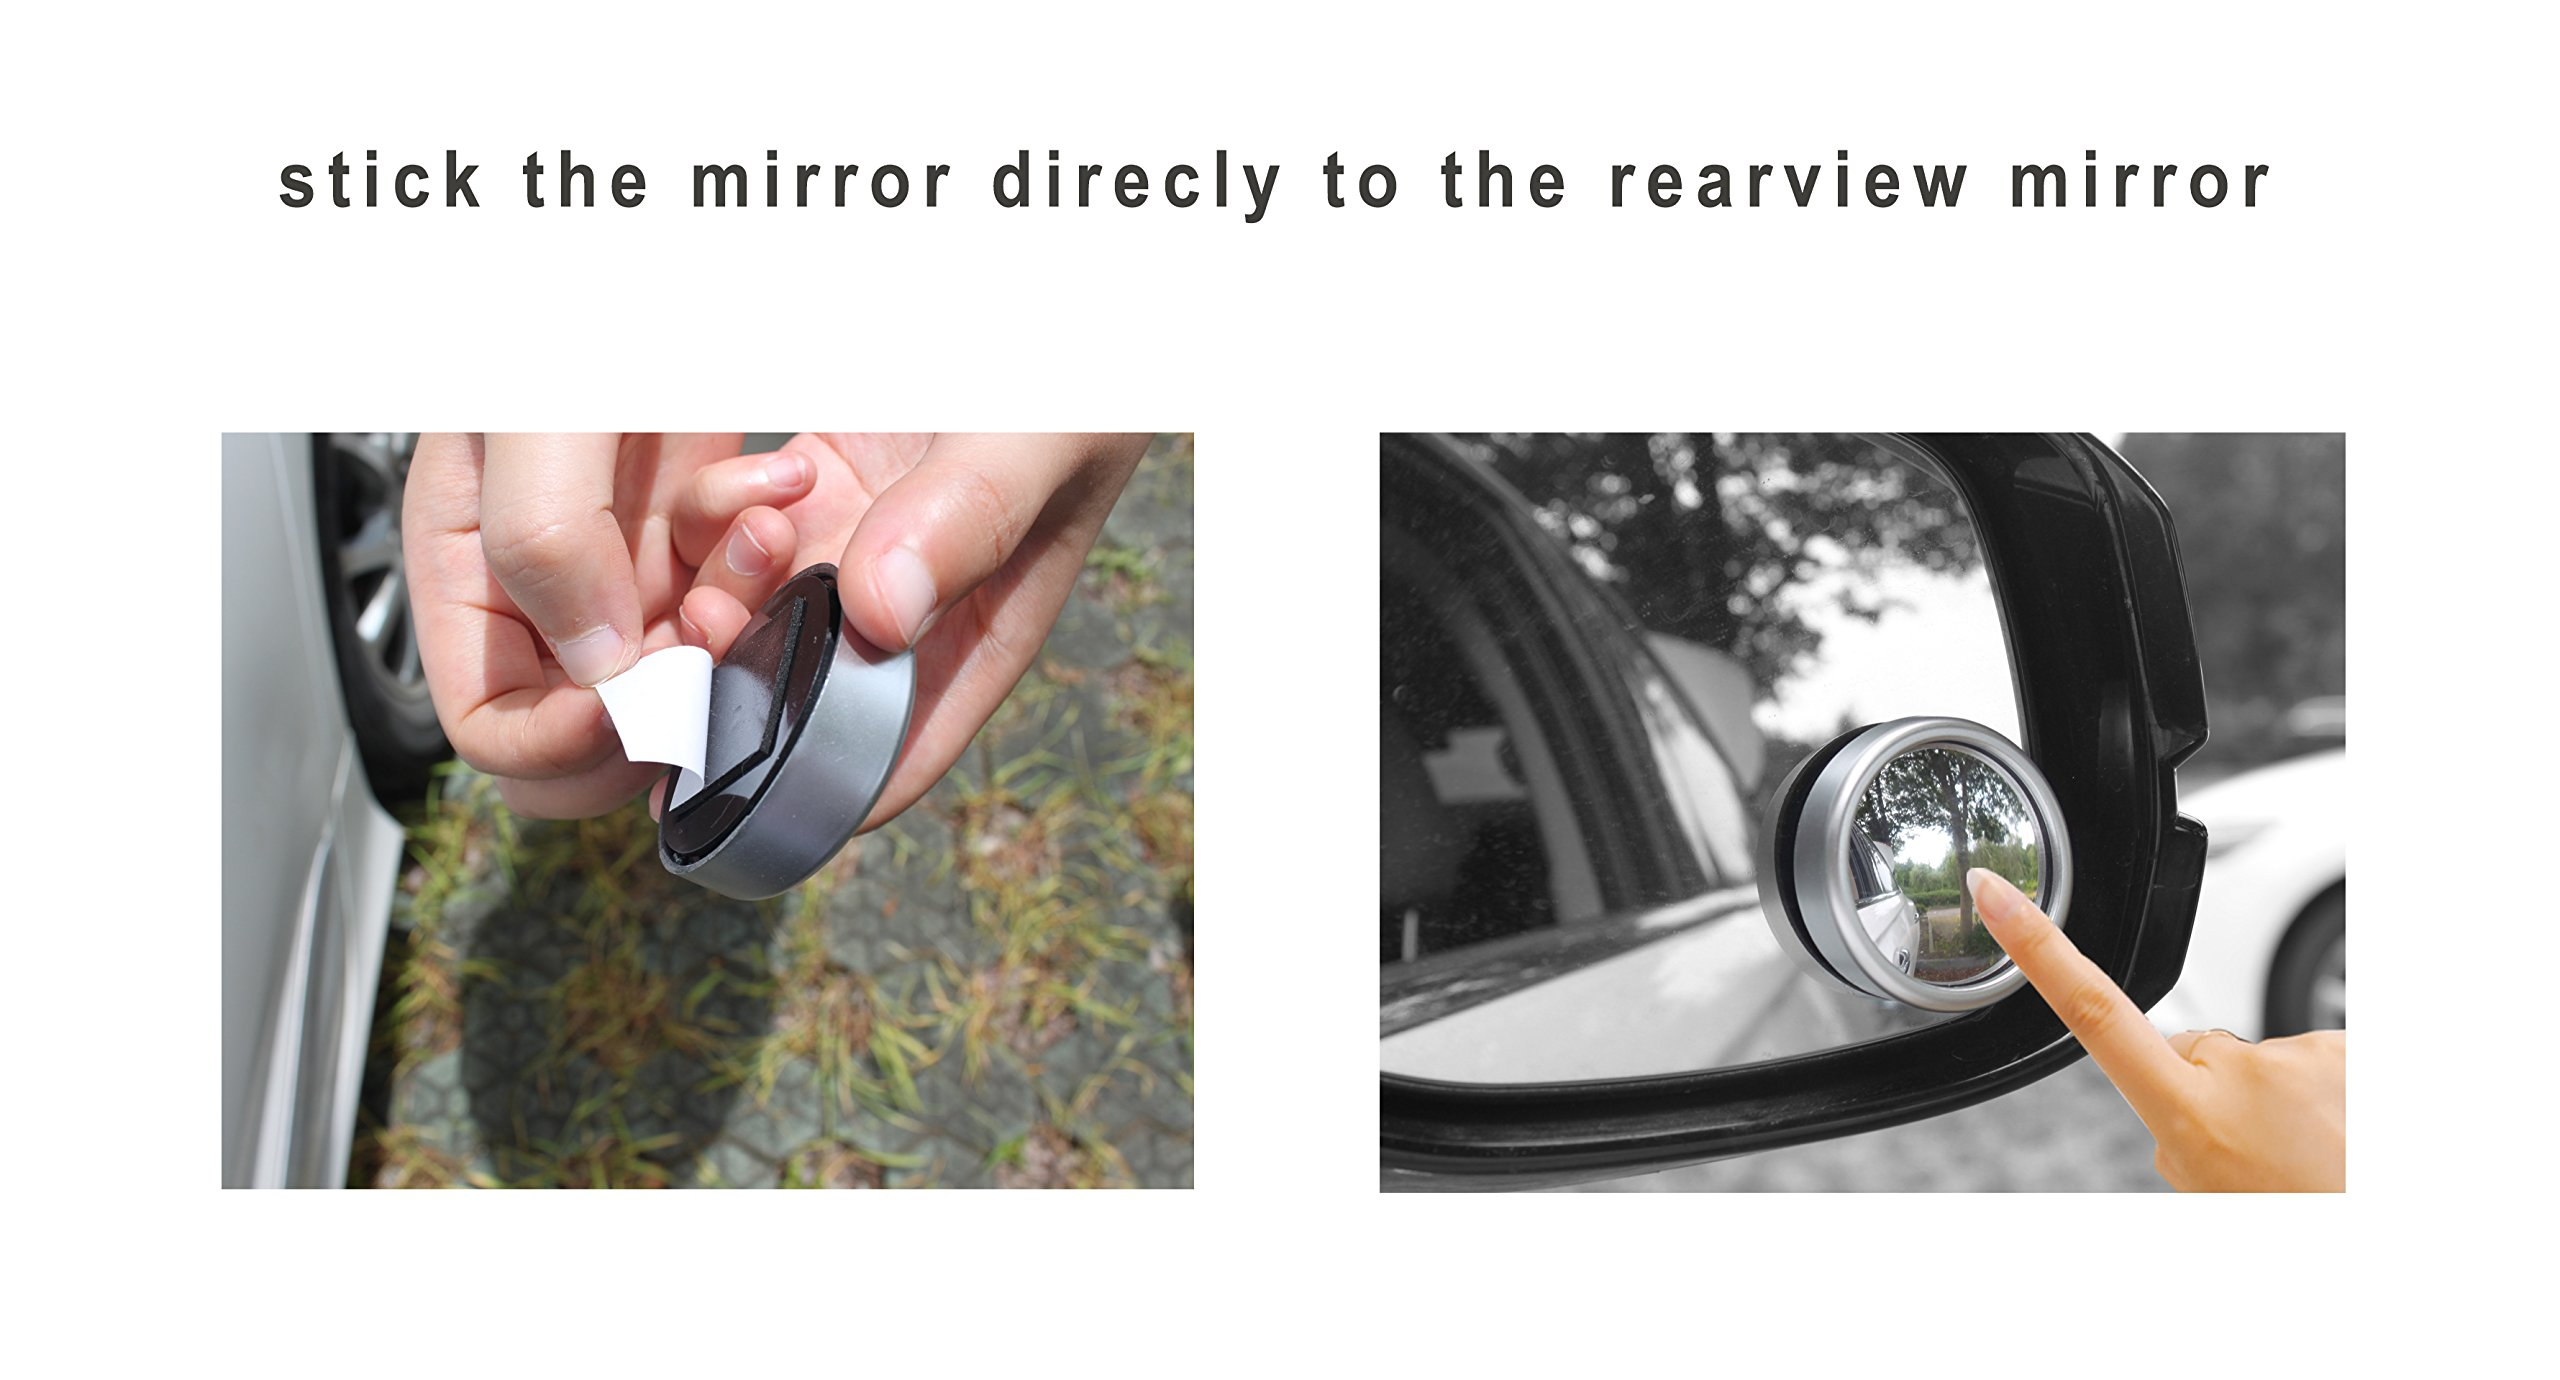 Durapower Blind Spot Mirror, 2'' Round HD Glass Convex Rear View Mirror, Pack of 2 by Durapower (Image #4)